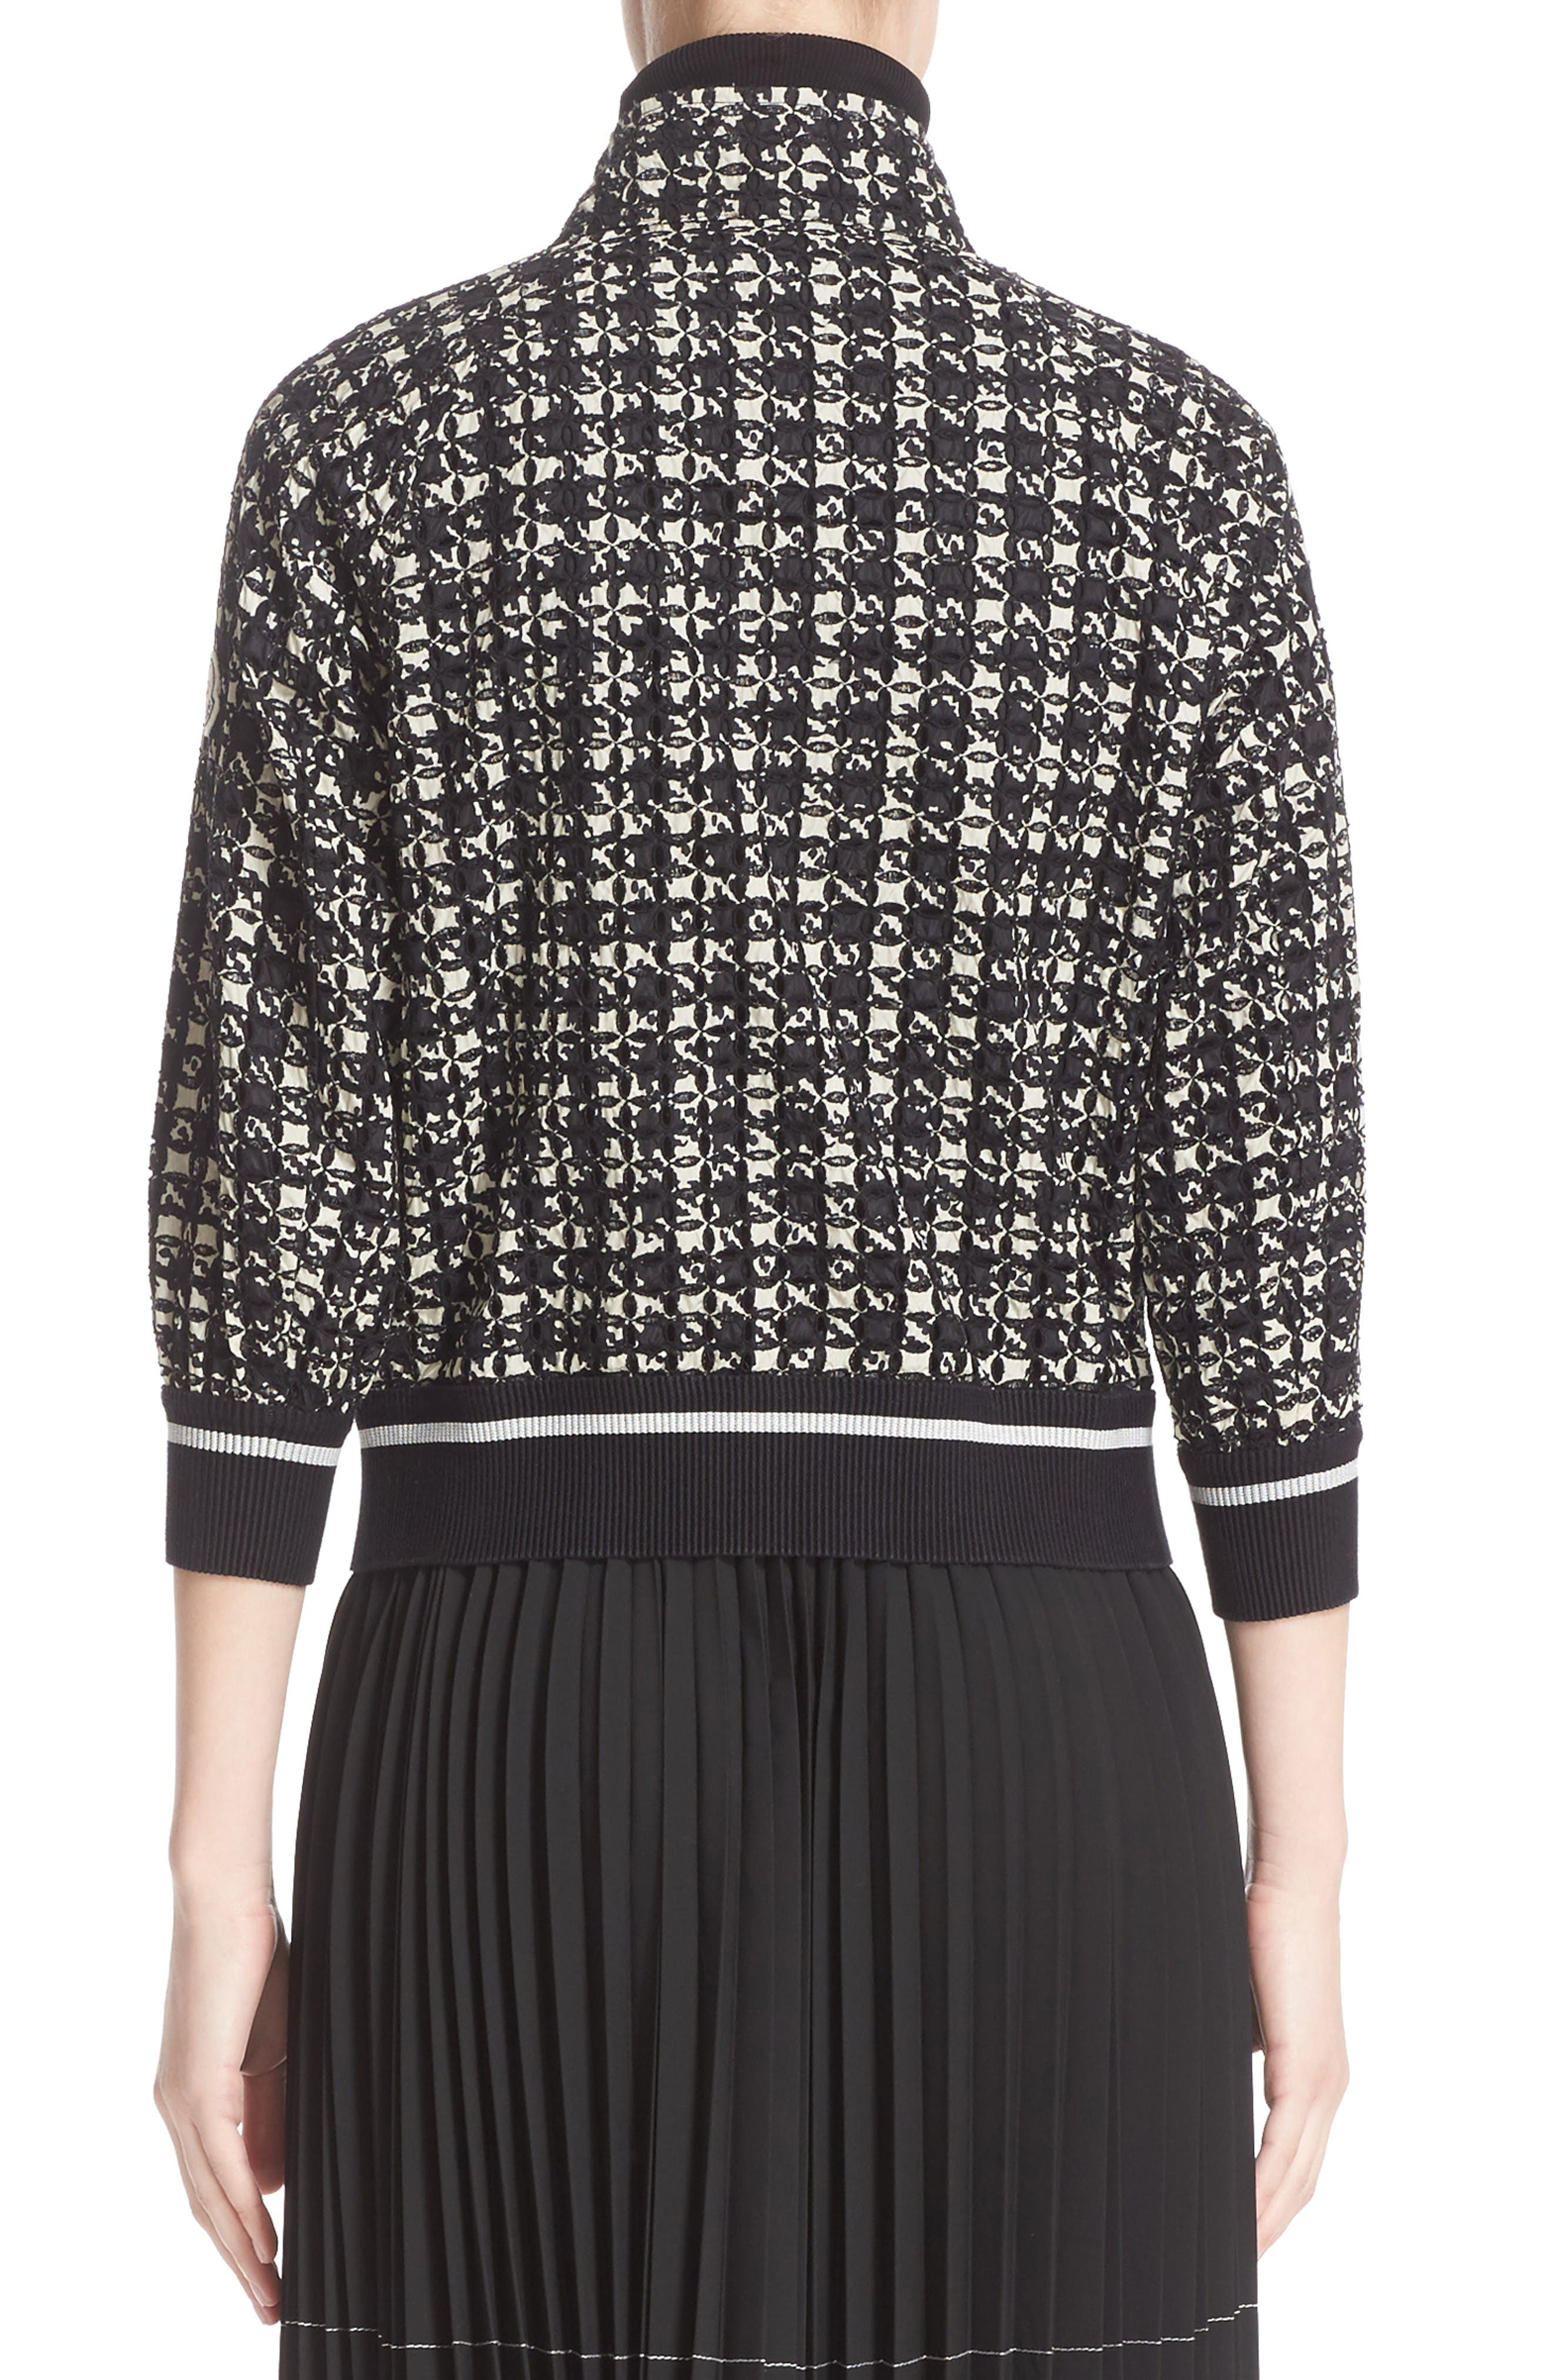 Fiadone Tweed Print Jacket,                             Alternate thumbnail 2, color,                             Black